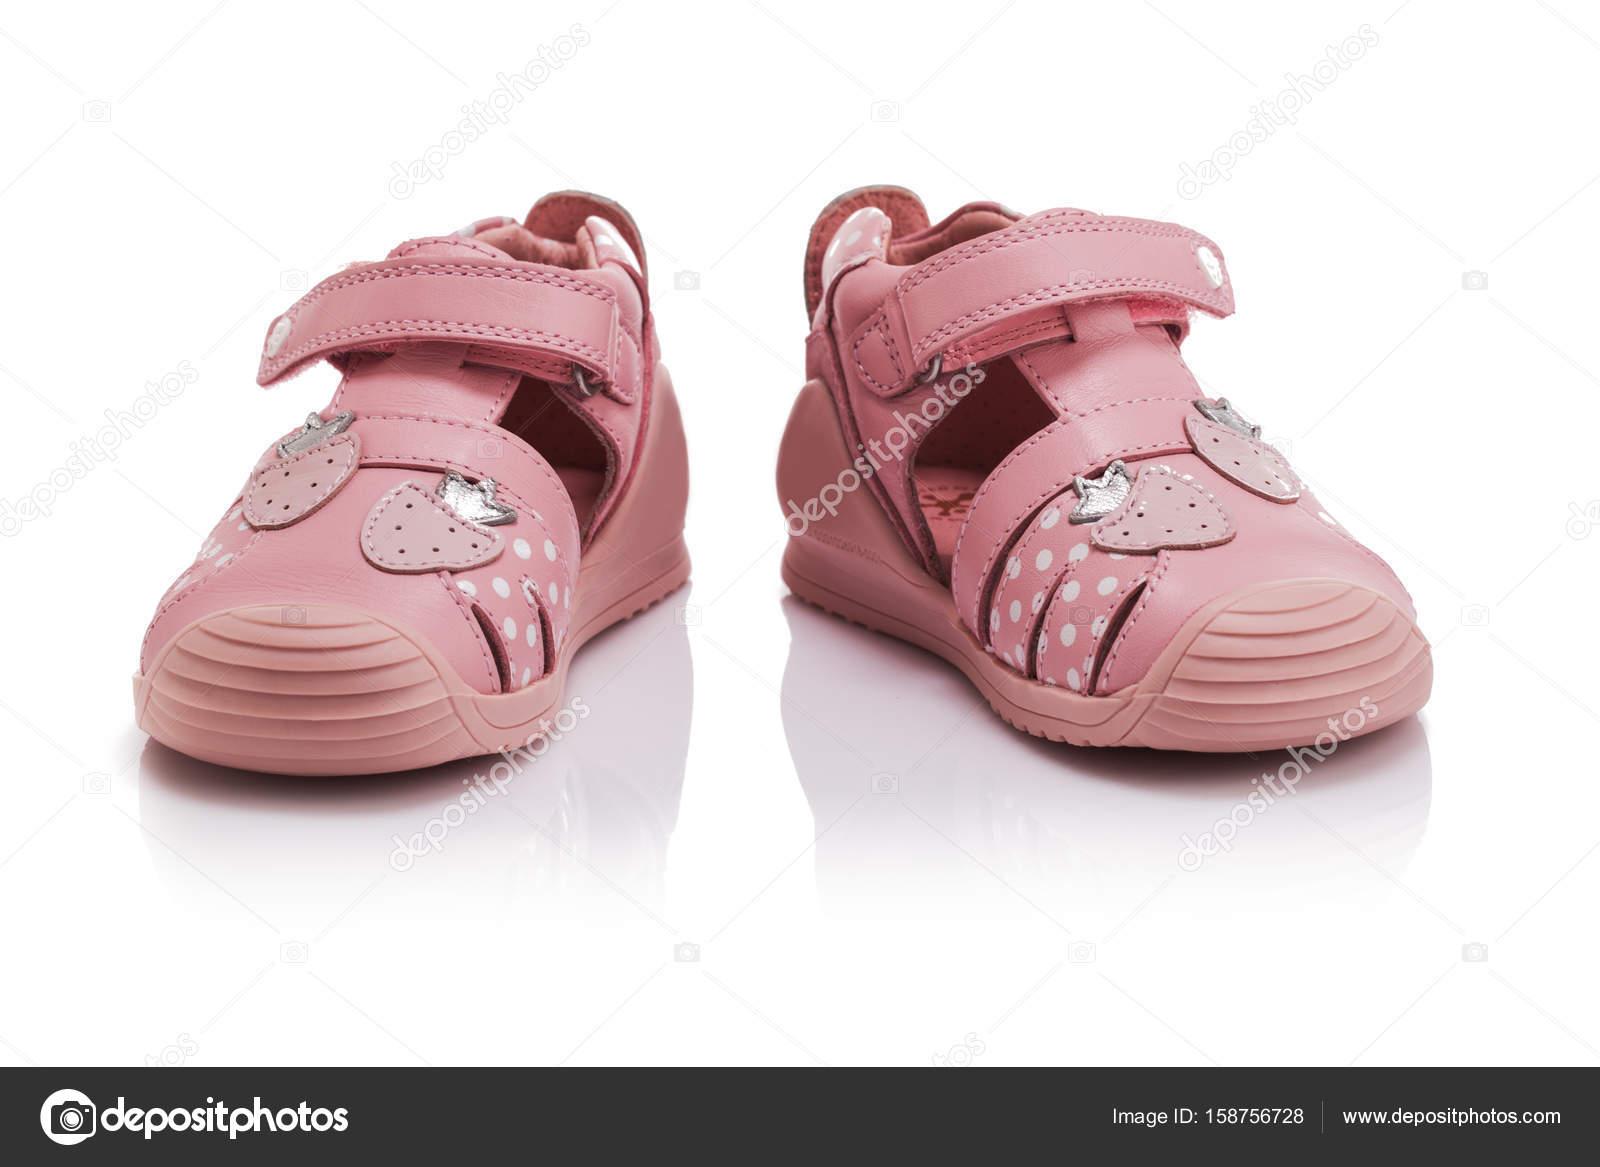 c51df6491f6 Ορθοπεδικά μωρό κορίτσι καλοκαίρι ΣΑΝΔΑΛΙΑ απομονωθεί σε λευκό — Φωτογραφία  Αρχείου